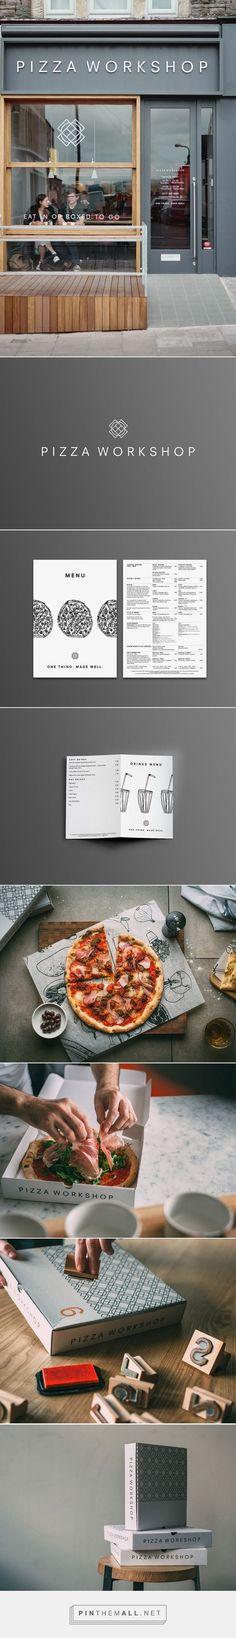 Pizza Workshop | Identity Designed - created via https://pinthemall.net: